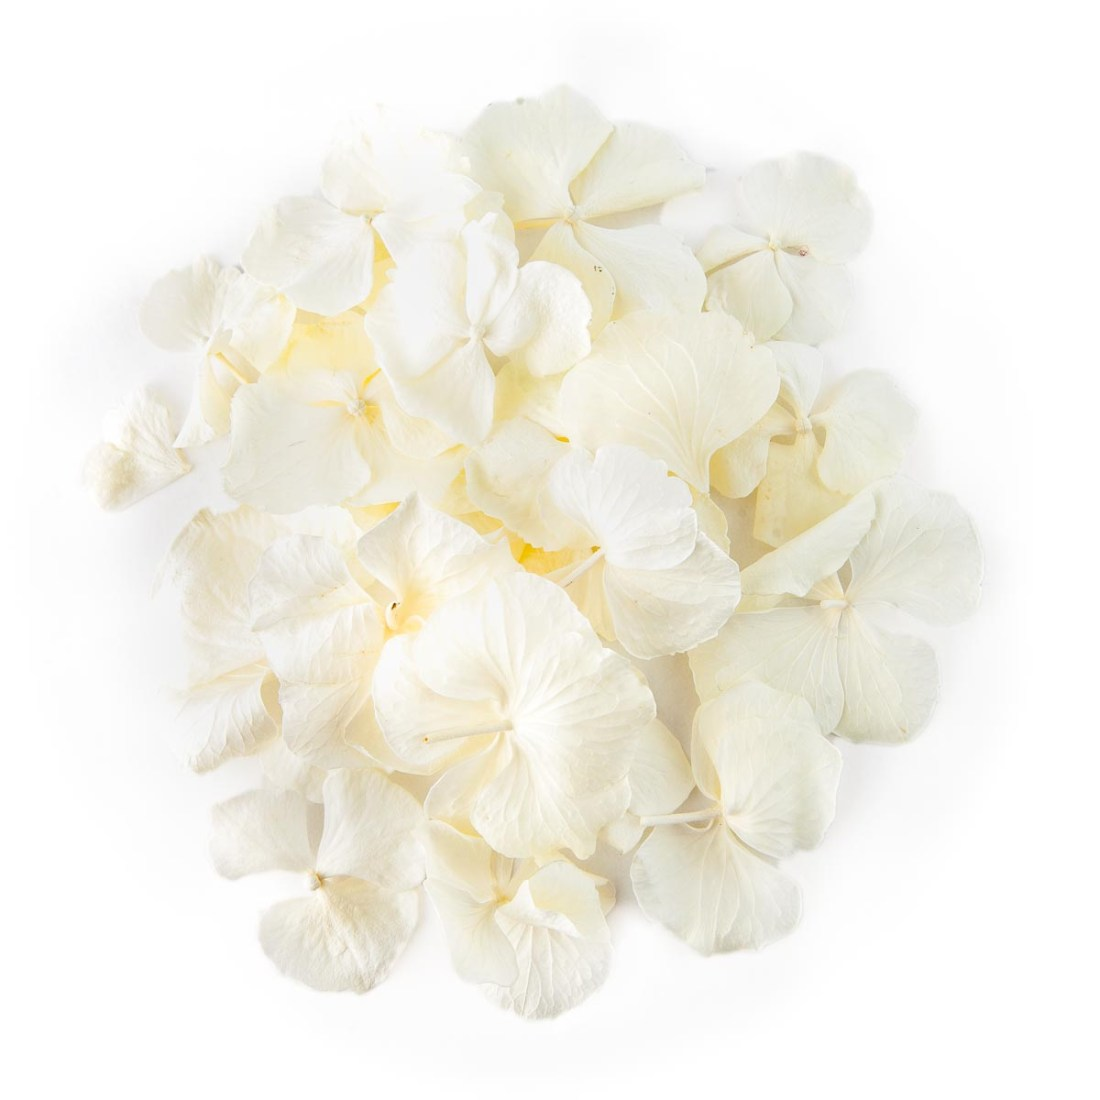 Flower petals - wedding aisles and petal pathways: White Hydrangea Petals